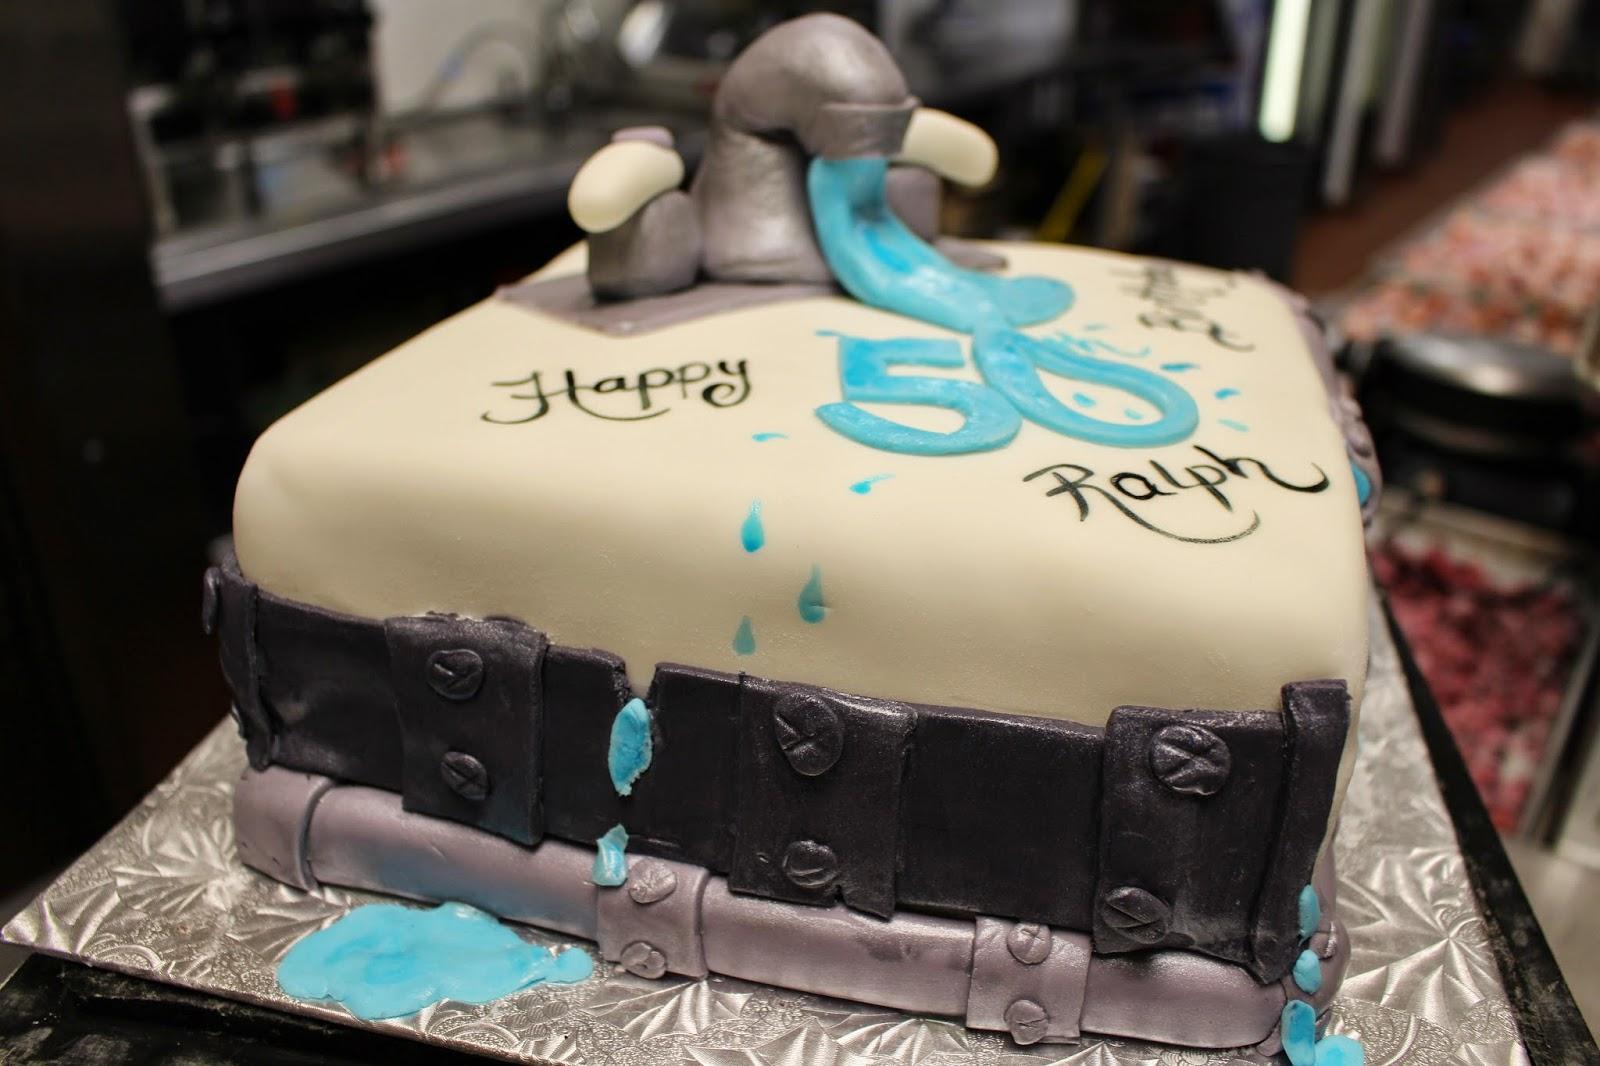 Morgie S Sweet Treats Plumber 50th Birthday Cake